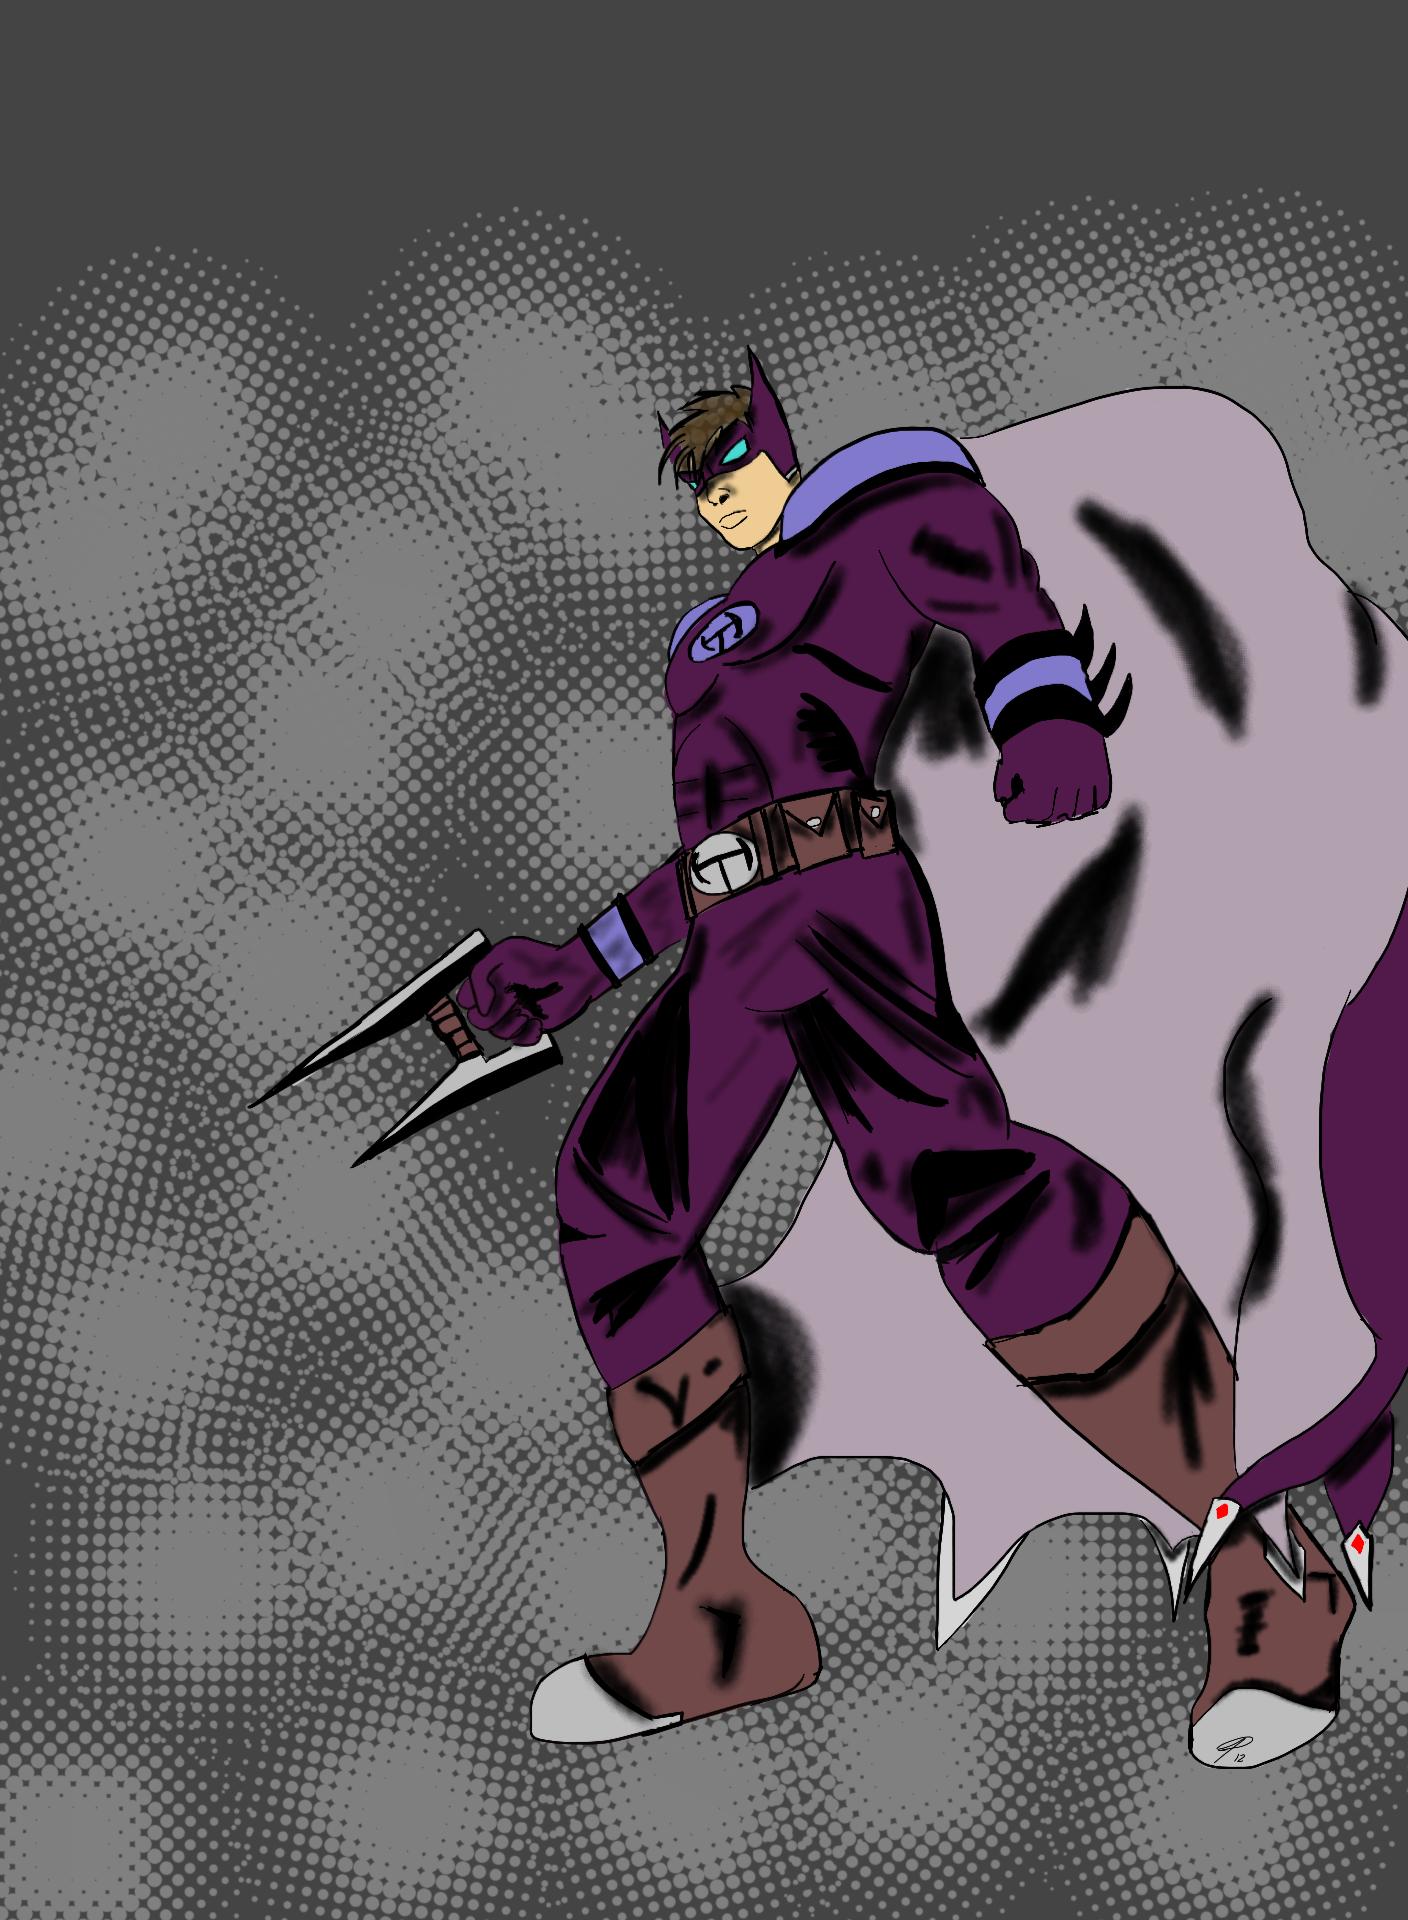 Talon-man